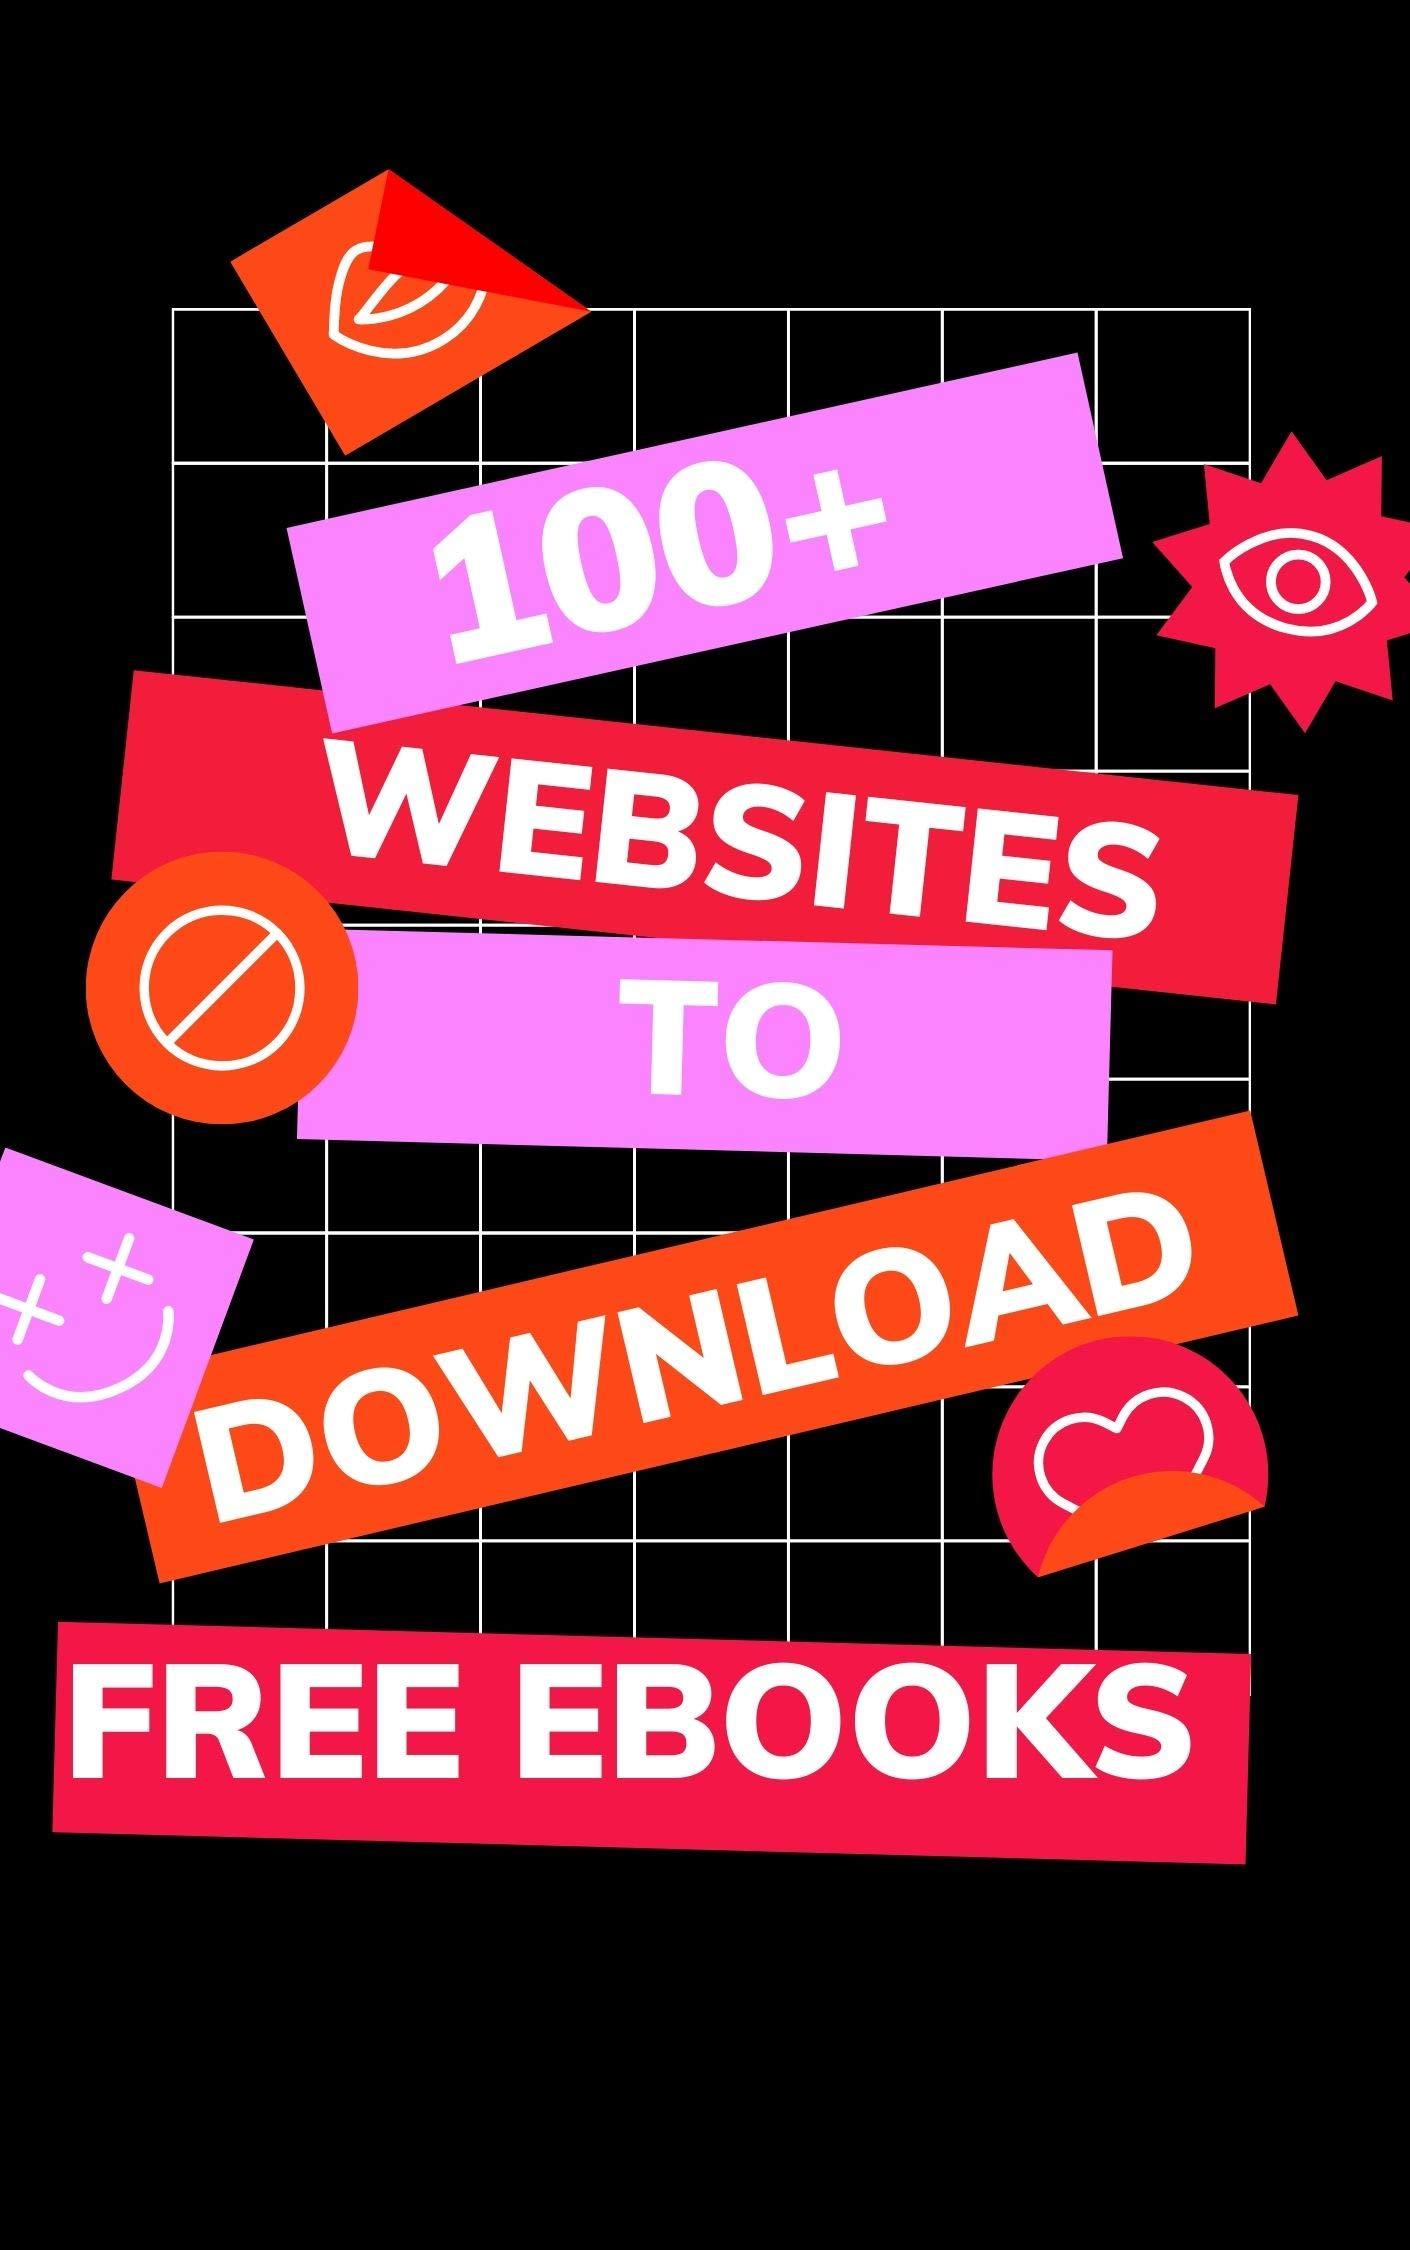 100+ Websites To Download Free Ebooks: Millions of eBooks